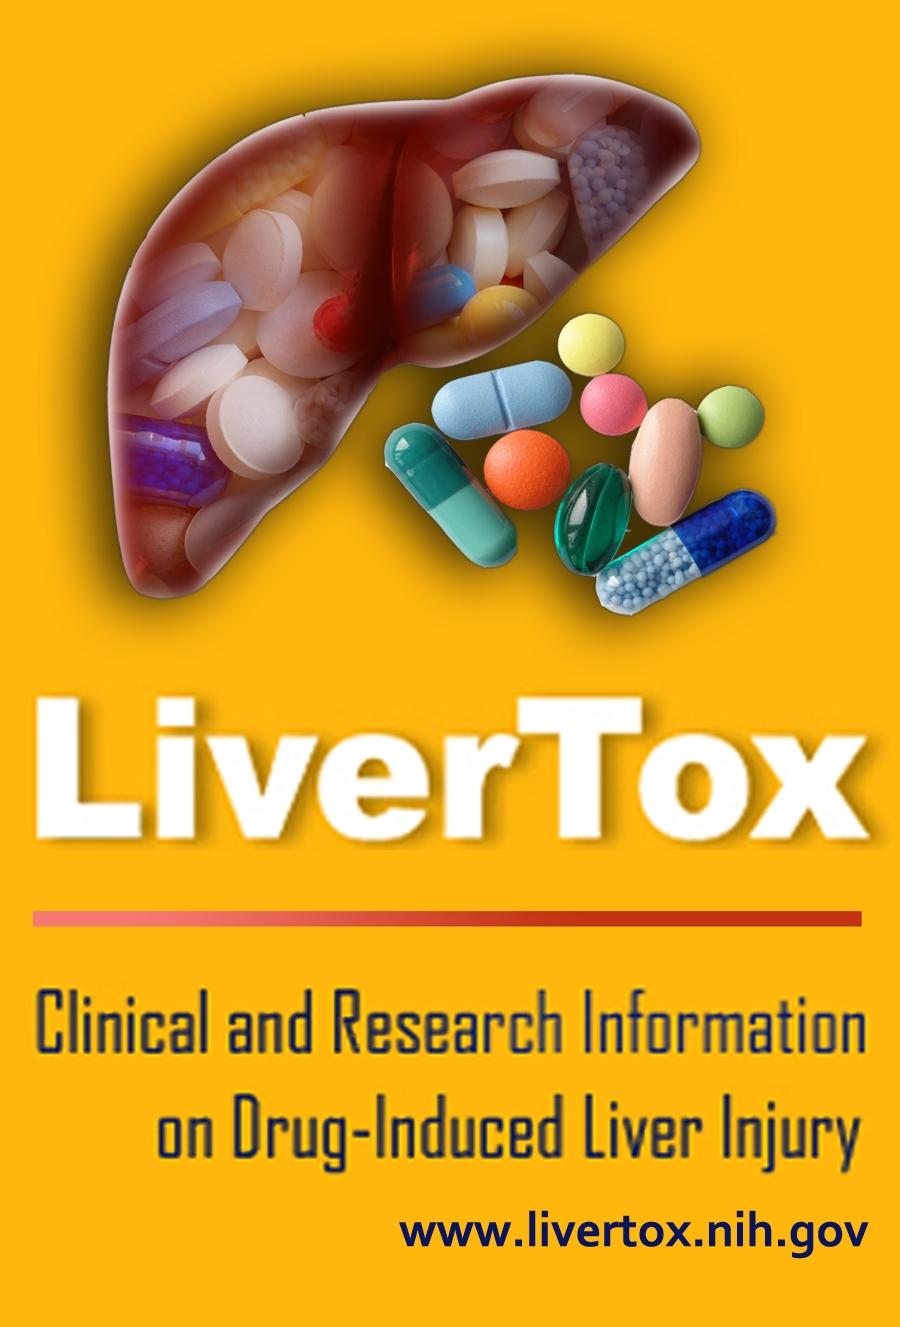 LiverTox_Logo_2012-09-26